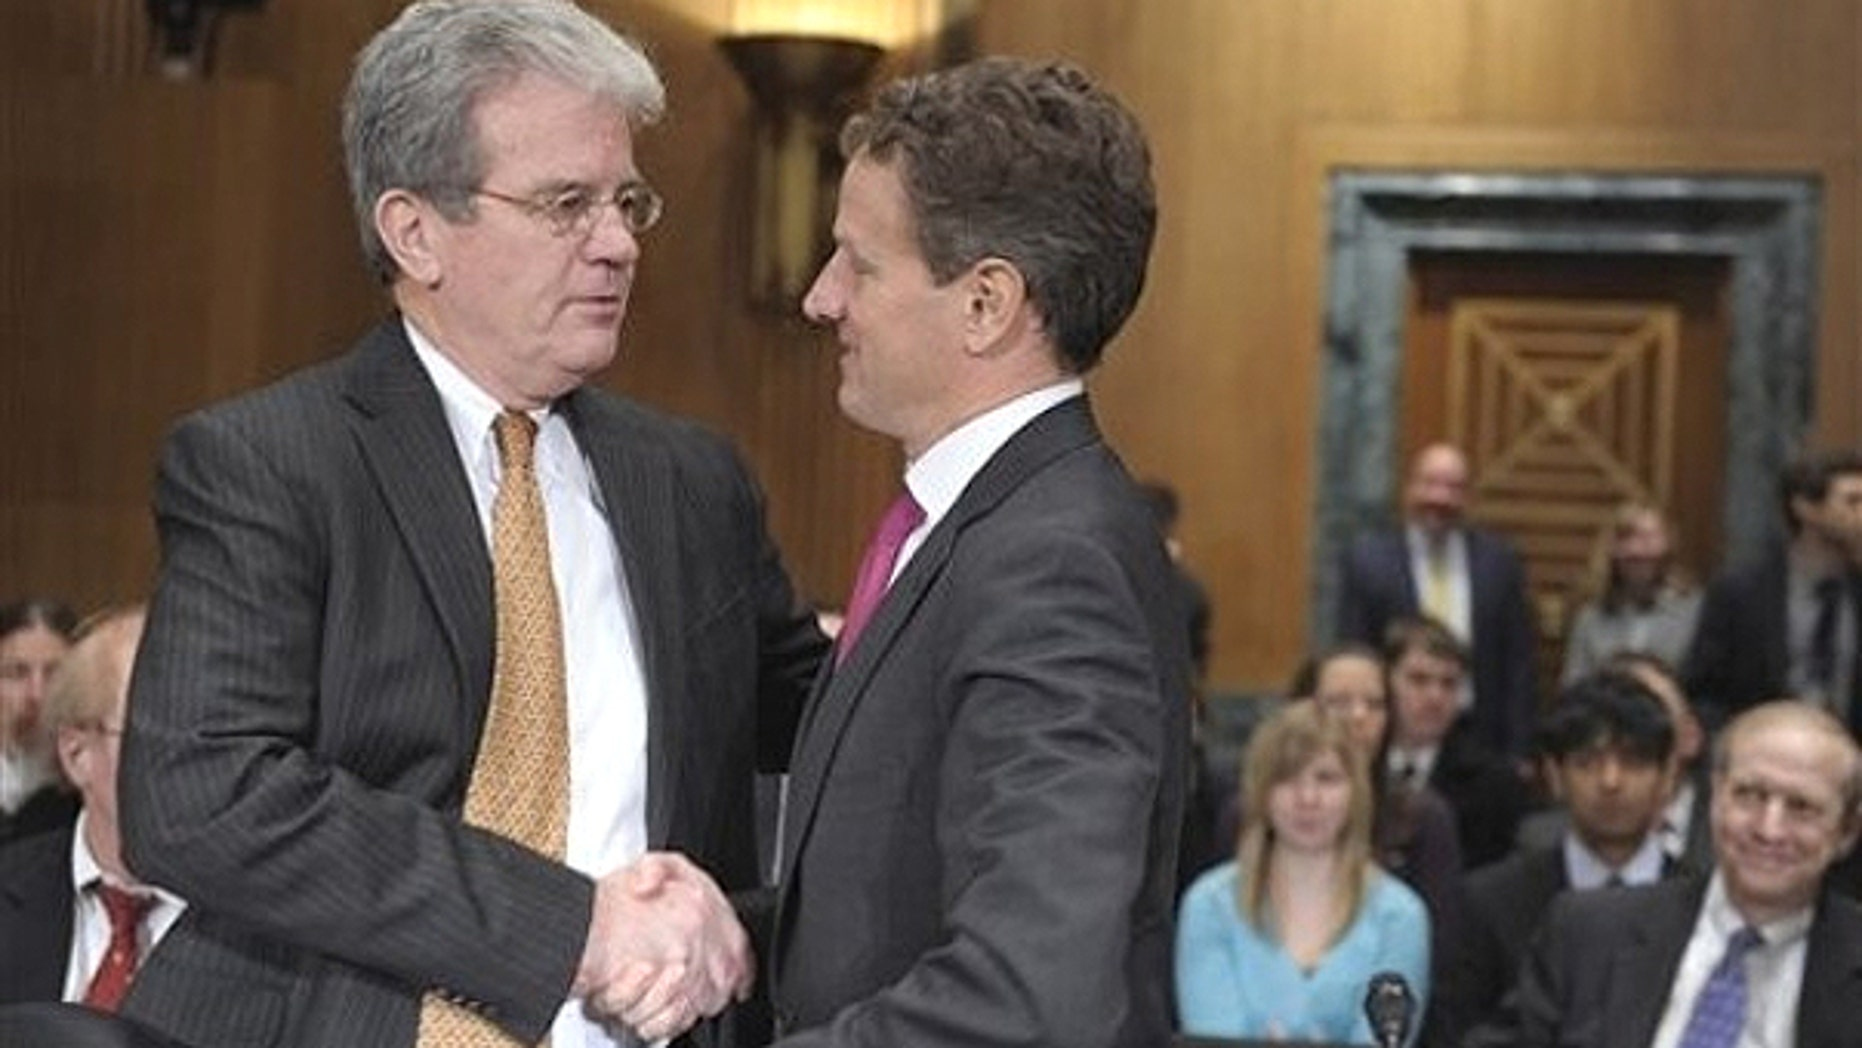 Feb. 16: Senate Finance Committee member Sen. Tom Coburn, R-Okla. , left., talks with Treasury Secretary Timothy Geithner on Capitol Hill in Washington.